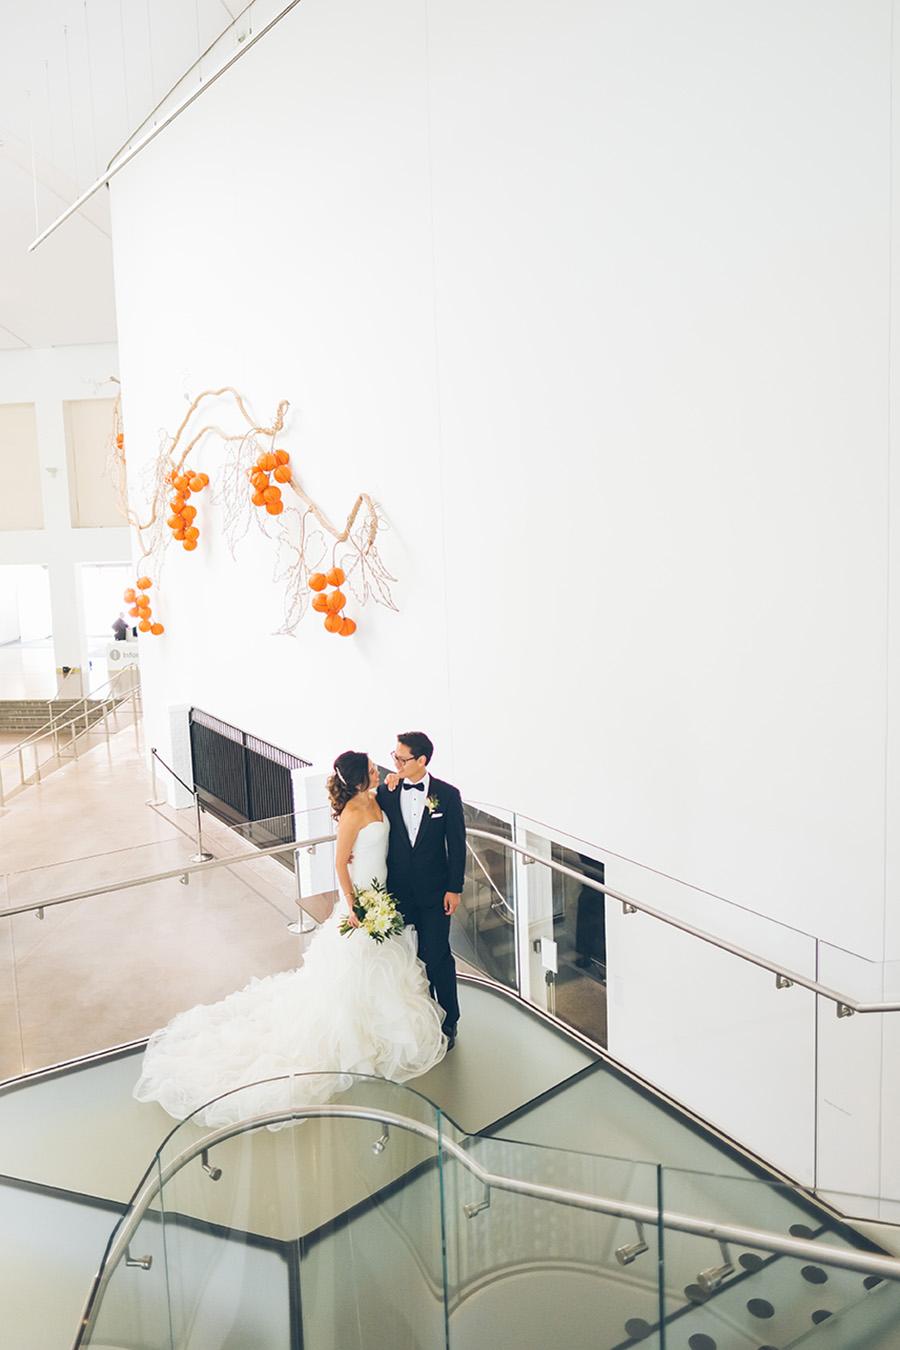 JUDITH-IRVING-NYC-WEDDING-BRIDEGROOM-CYNTHIACHUNG-0080.jpg